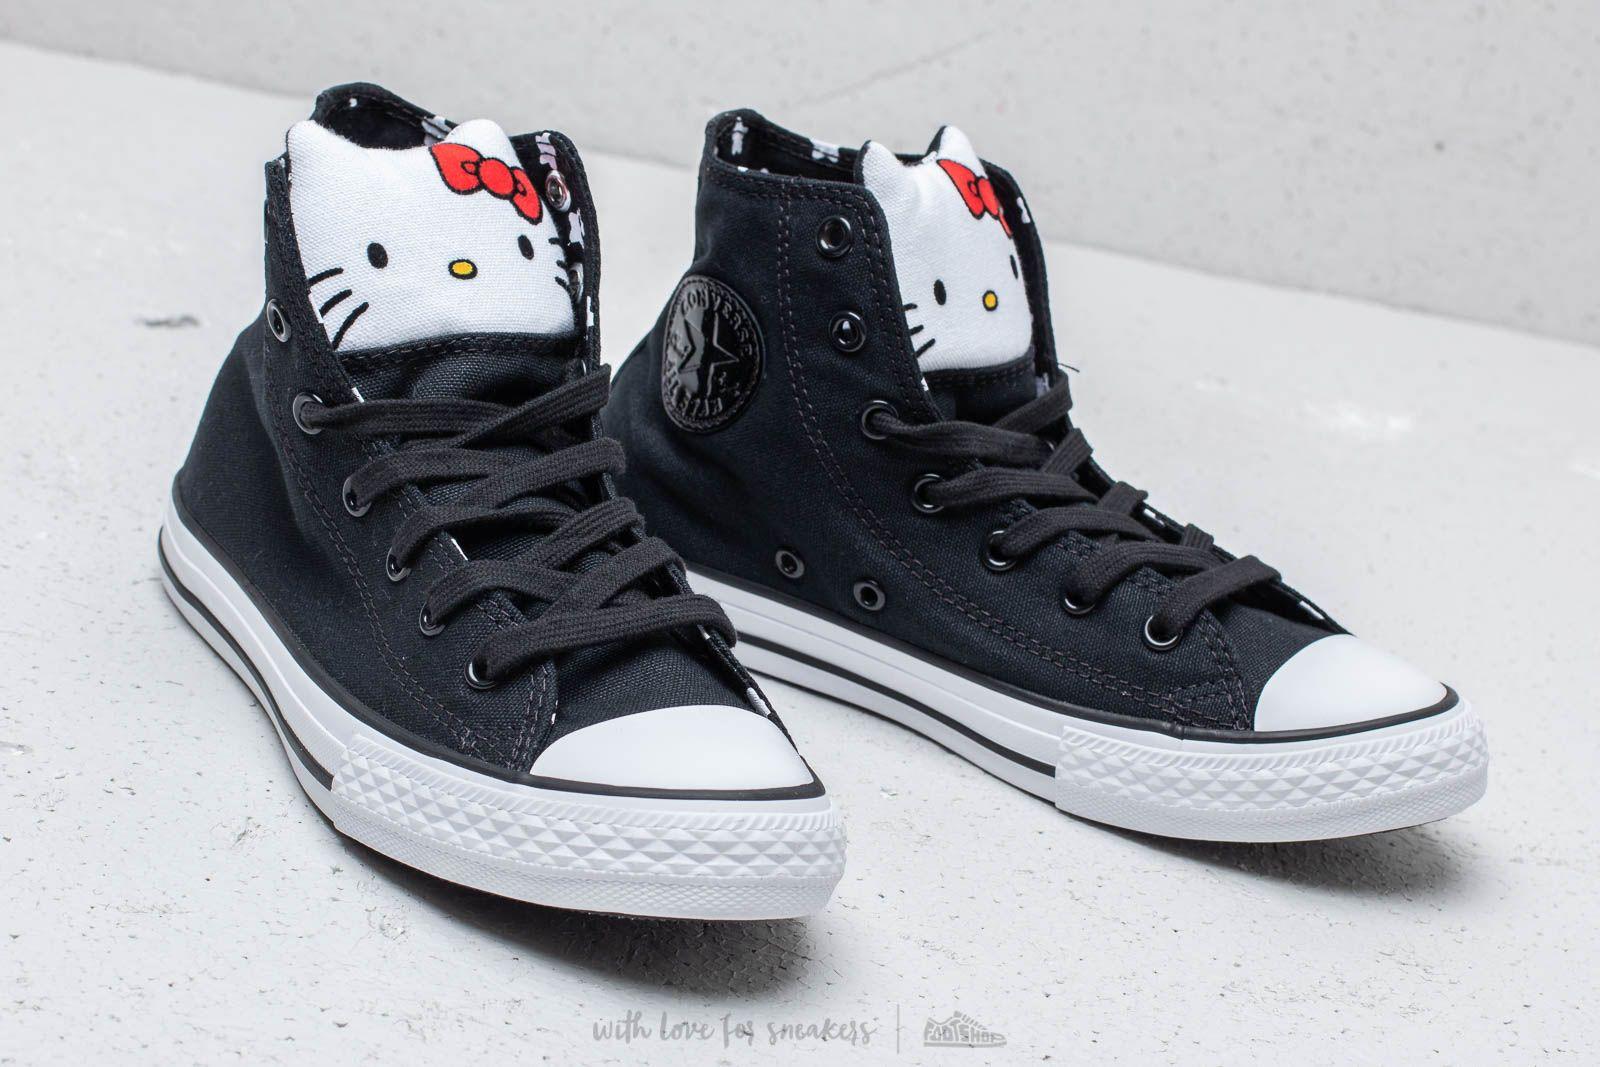 Converse x Hello Kitty Chuck Taylor All Star Hi Black Fiery Red White | Footshop